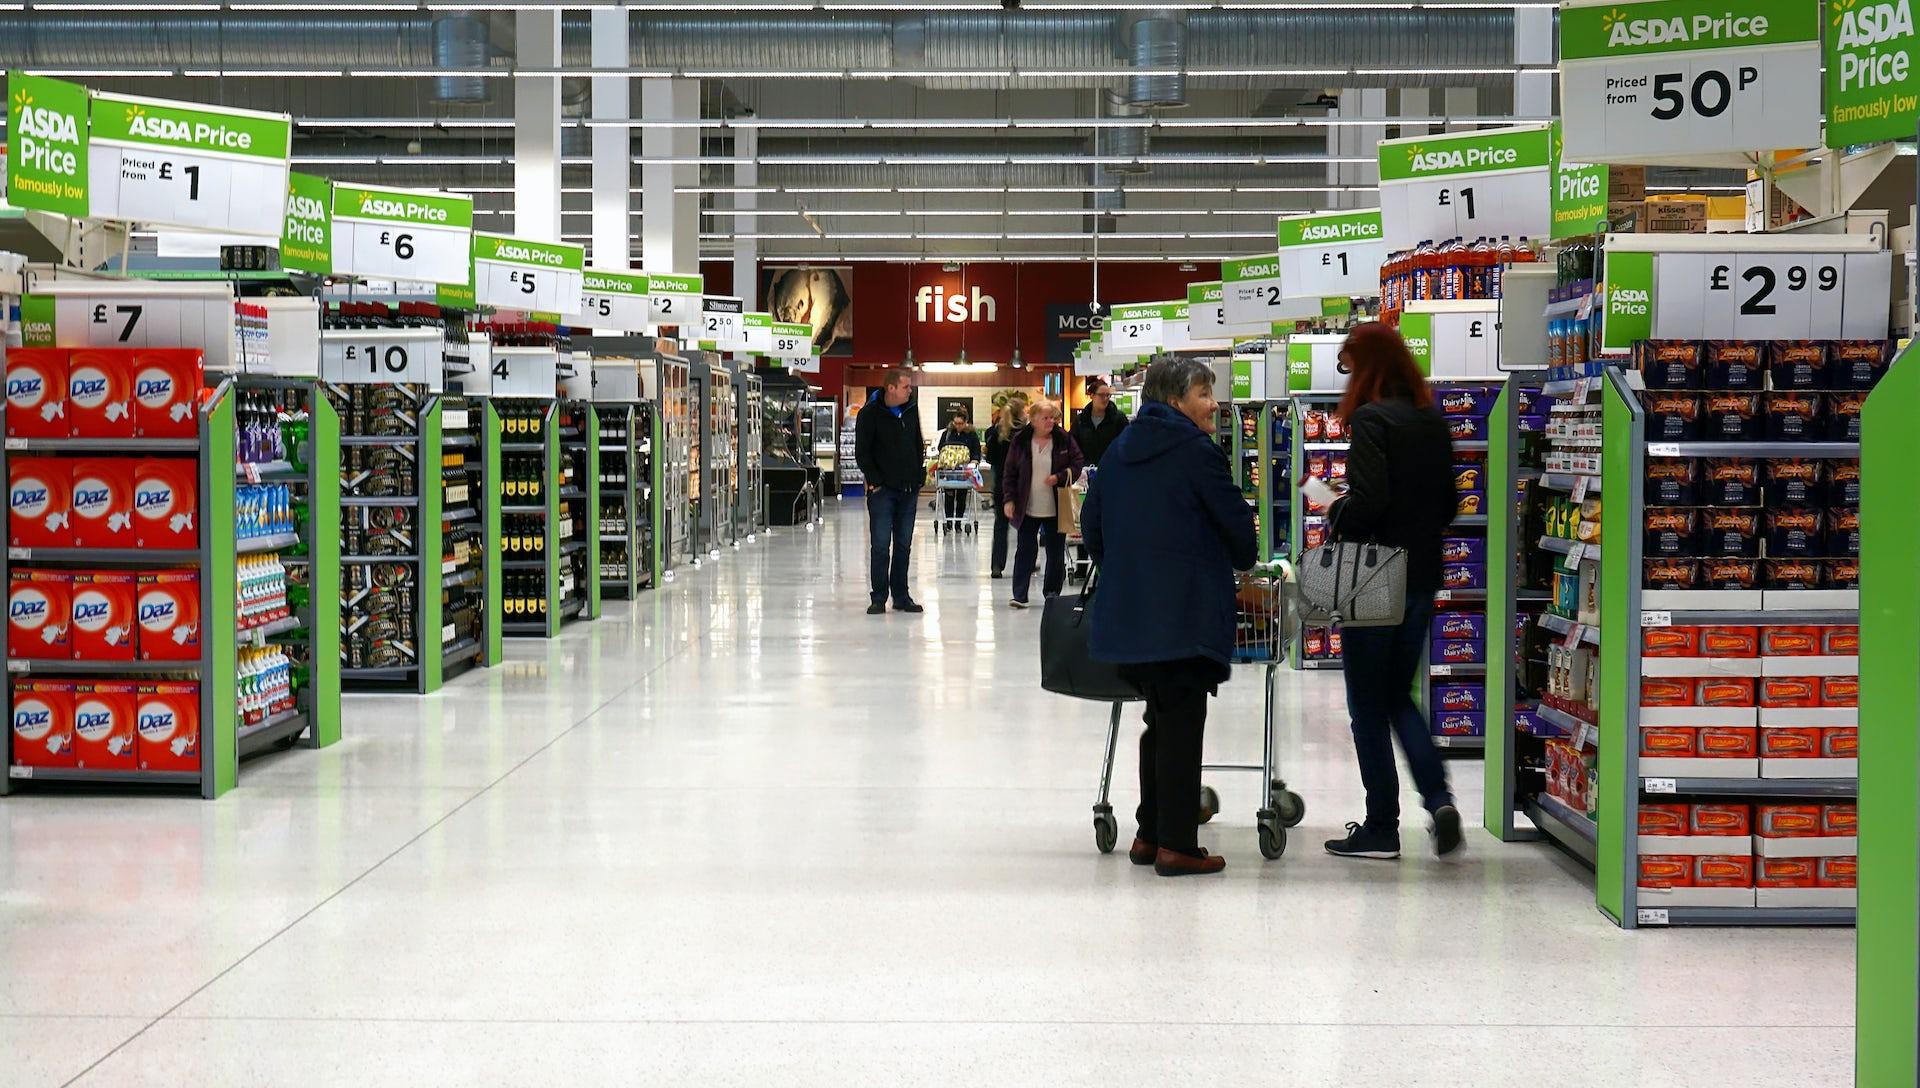 Leaflets supermarket uk